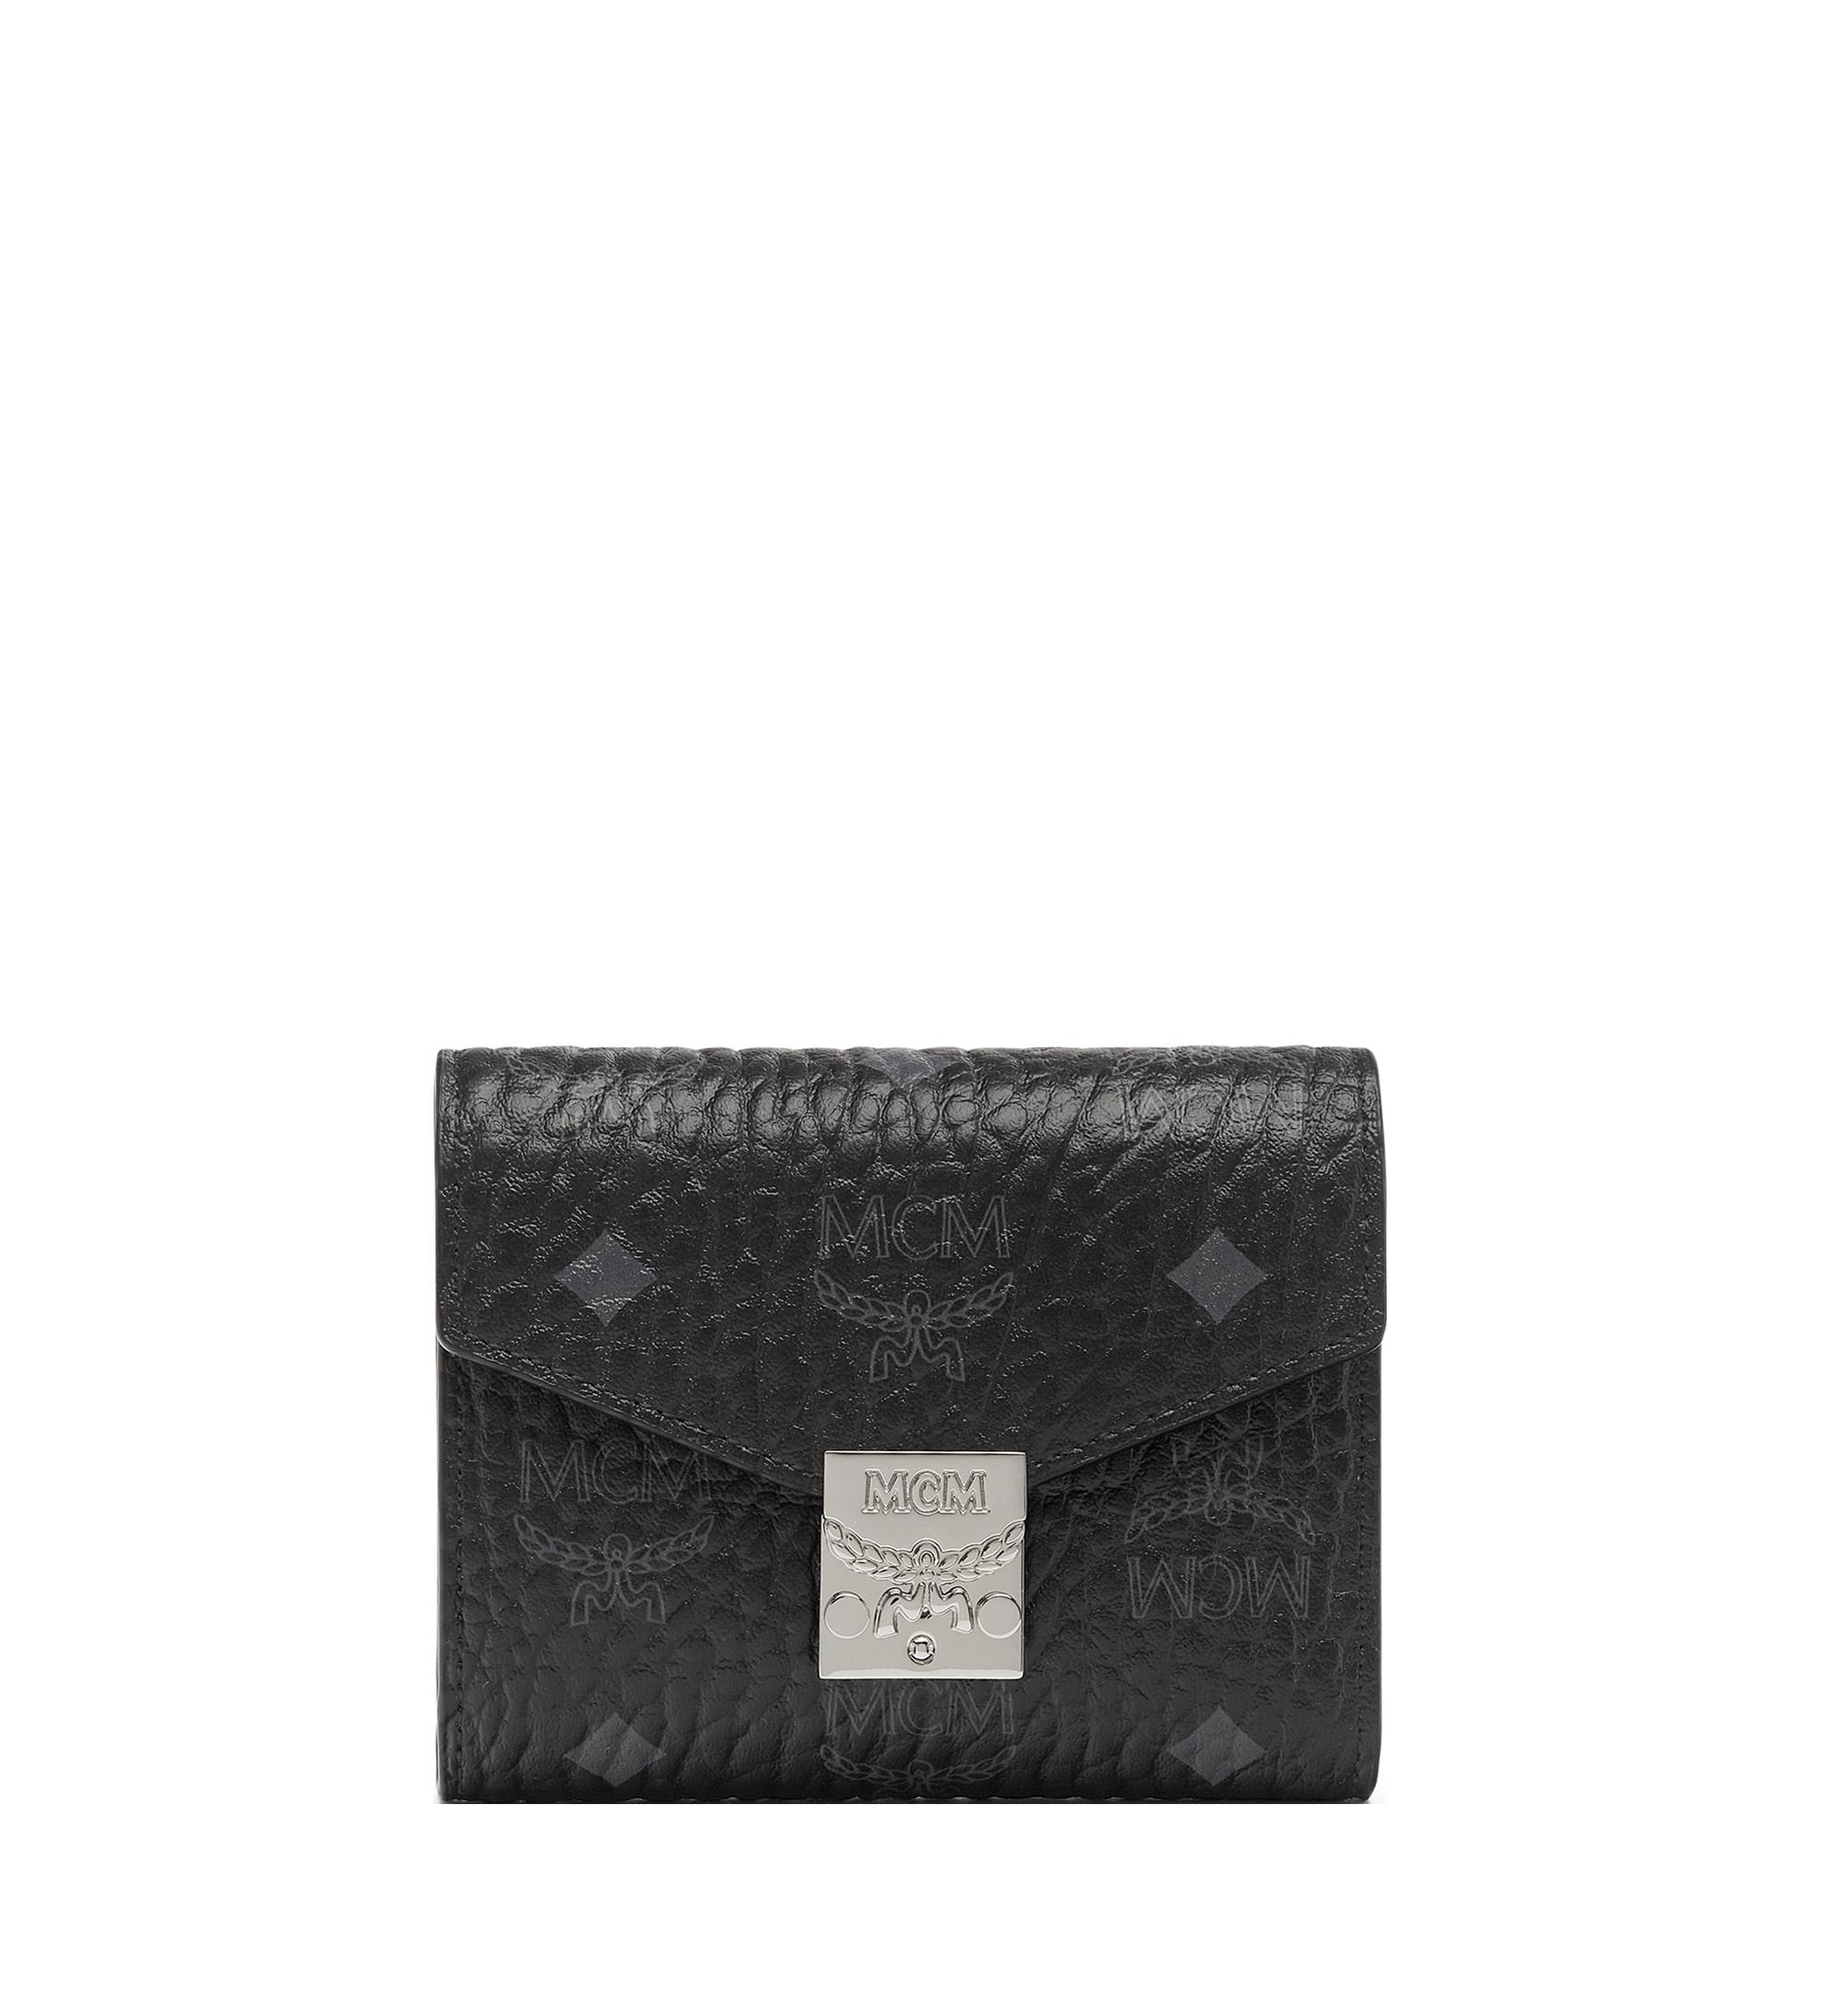 MCM Patricia Three Fold Wallet in Visetos Black MYS7SPA12BK001 Alternate View 1